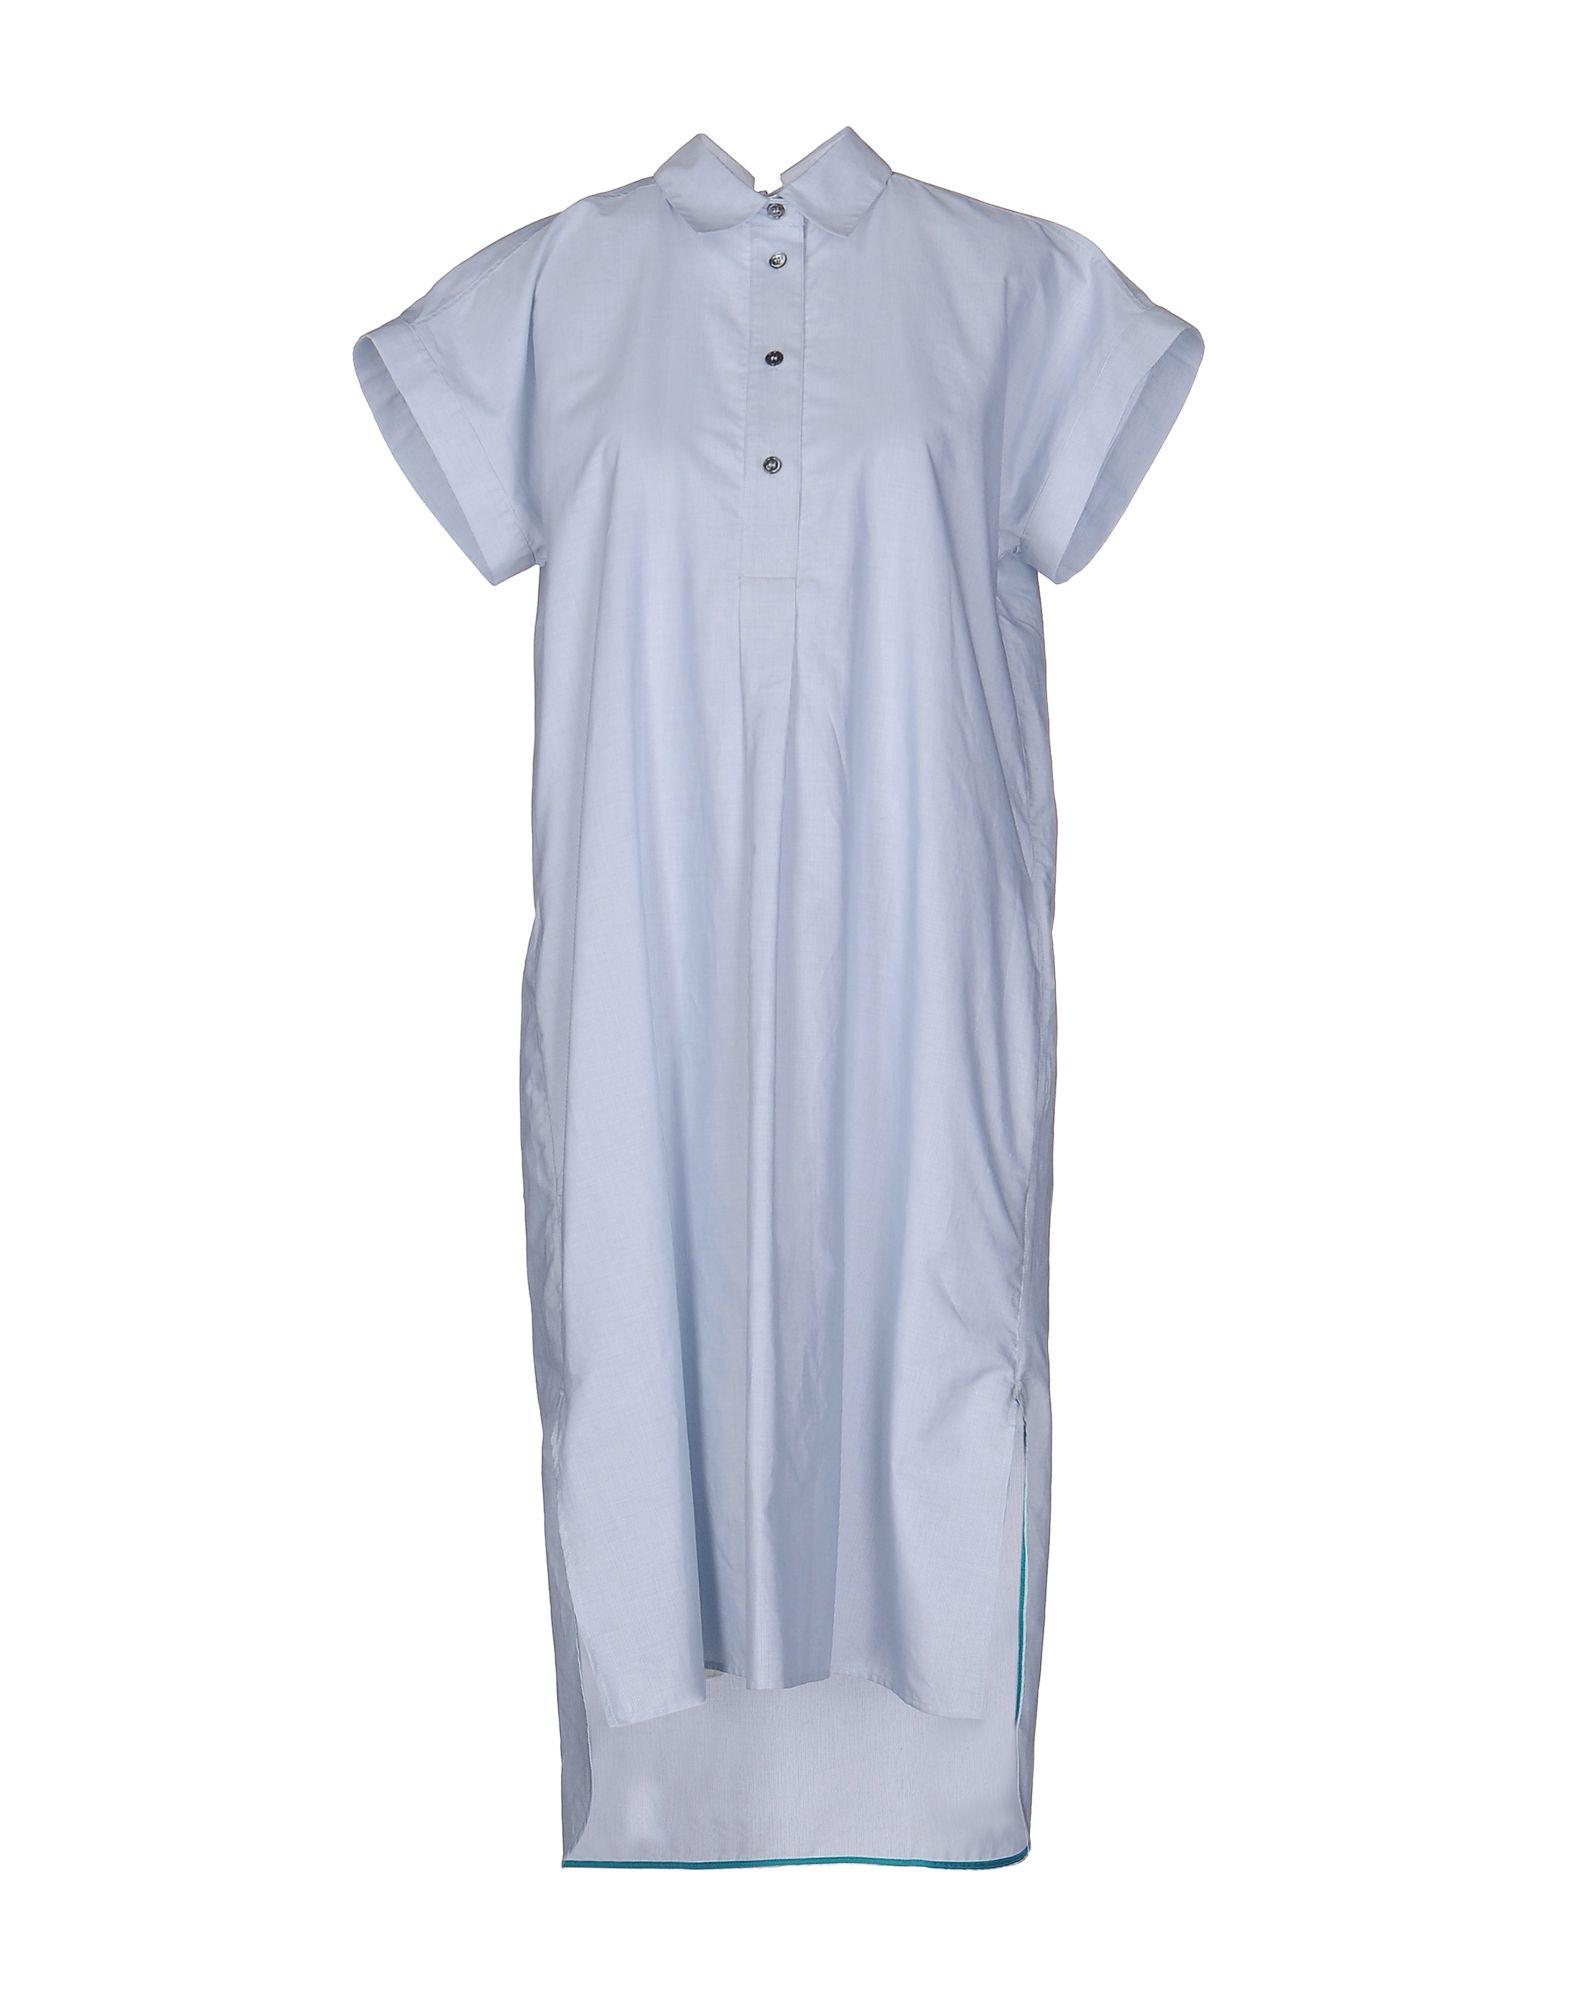 платье paul smith платья и сарафаны мини короткие PAUL SMITH Платье до колена